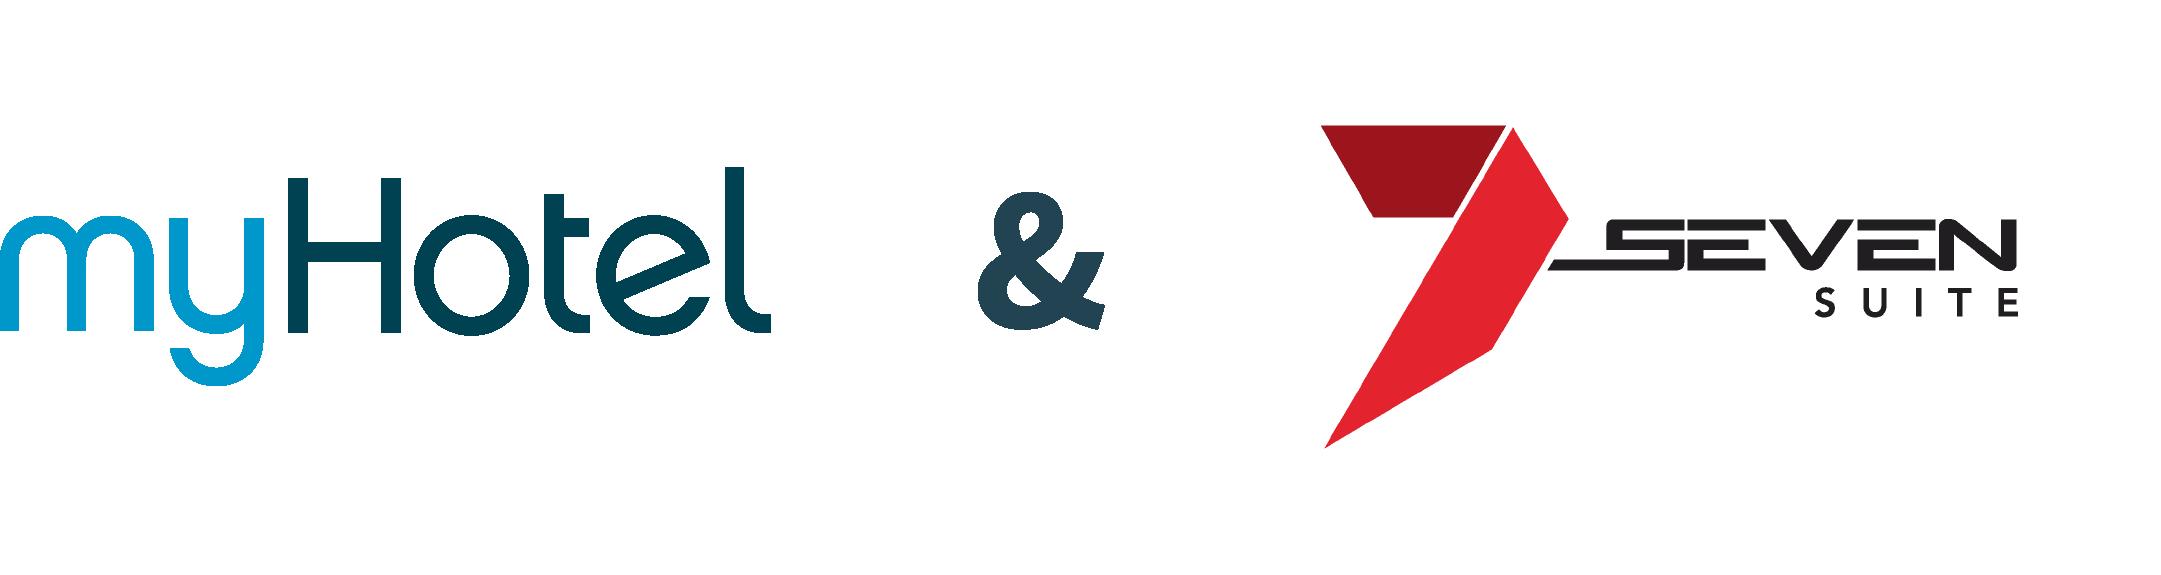 logos_1@4x